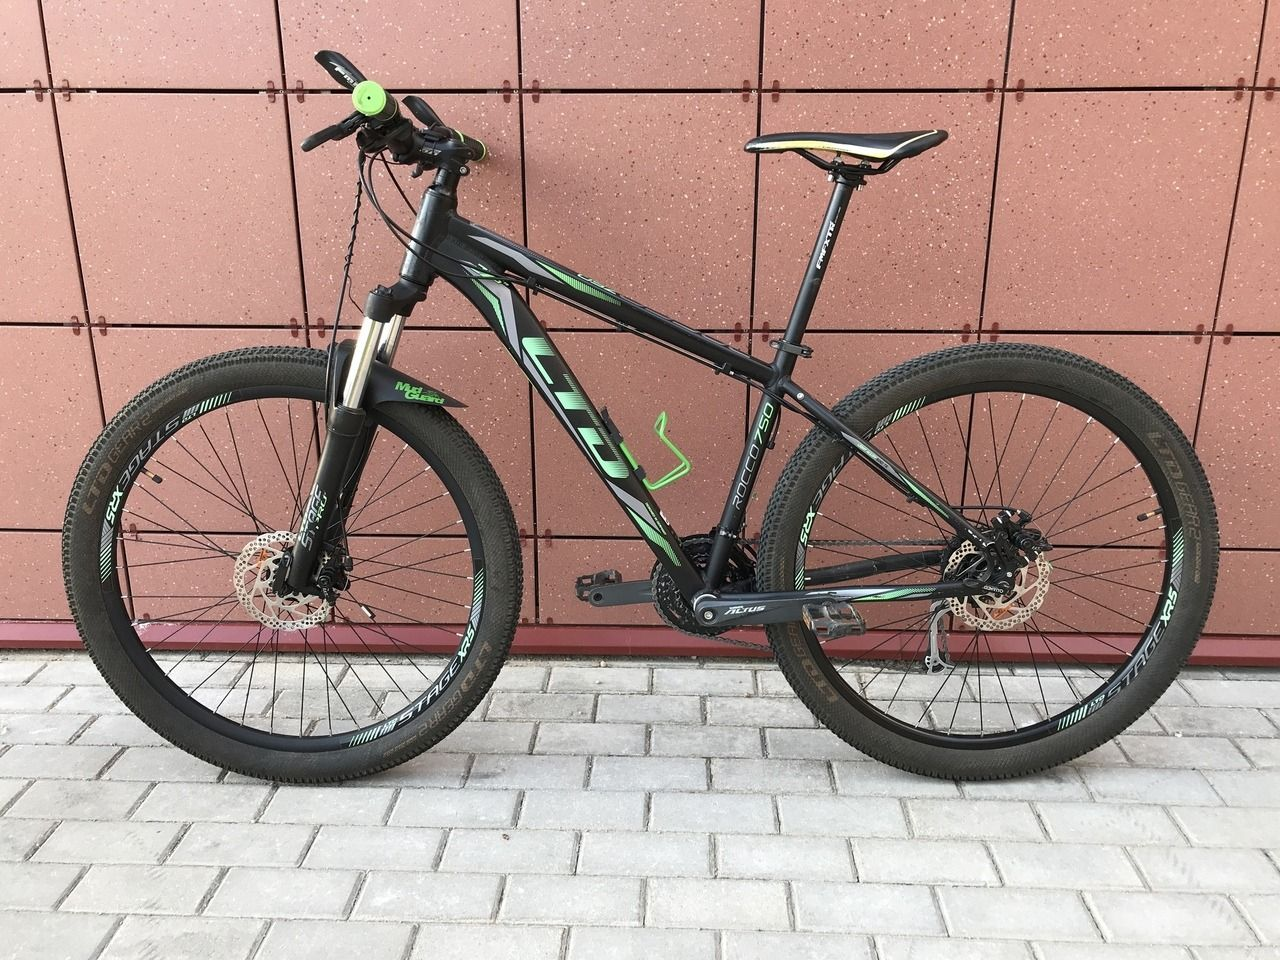 LTD Rocco 750 27.5